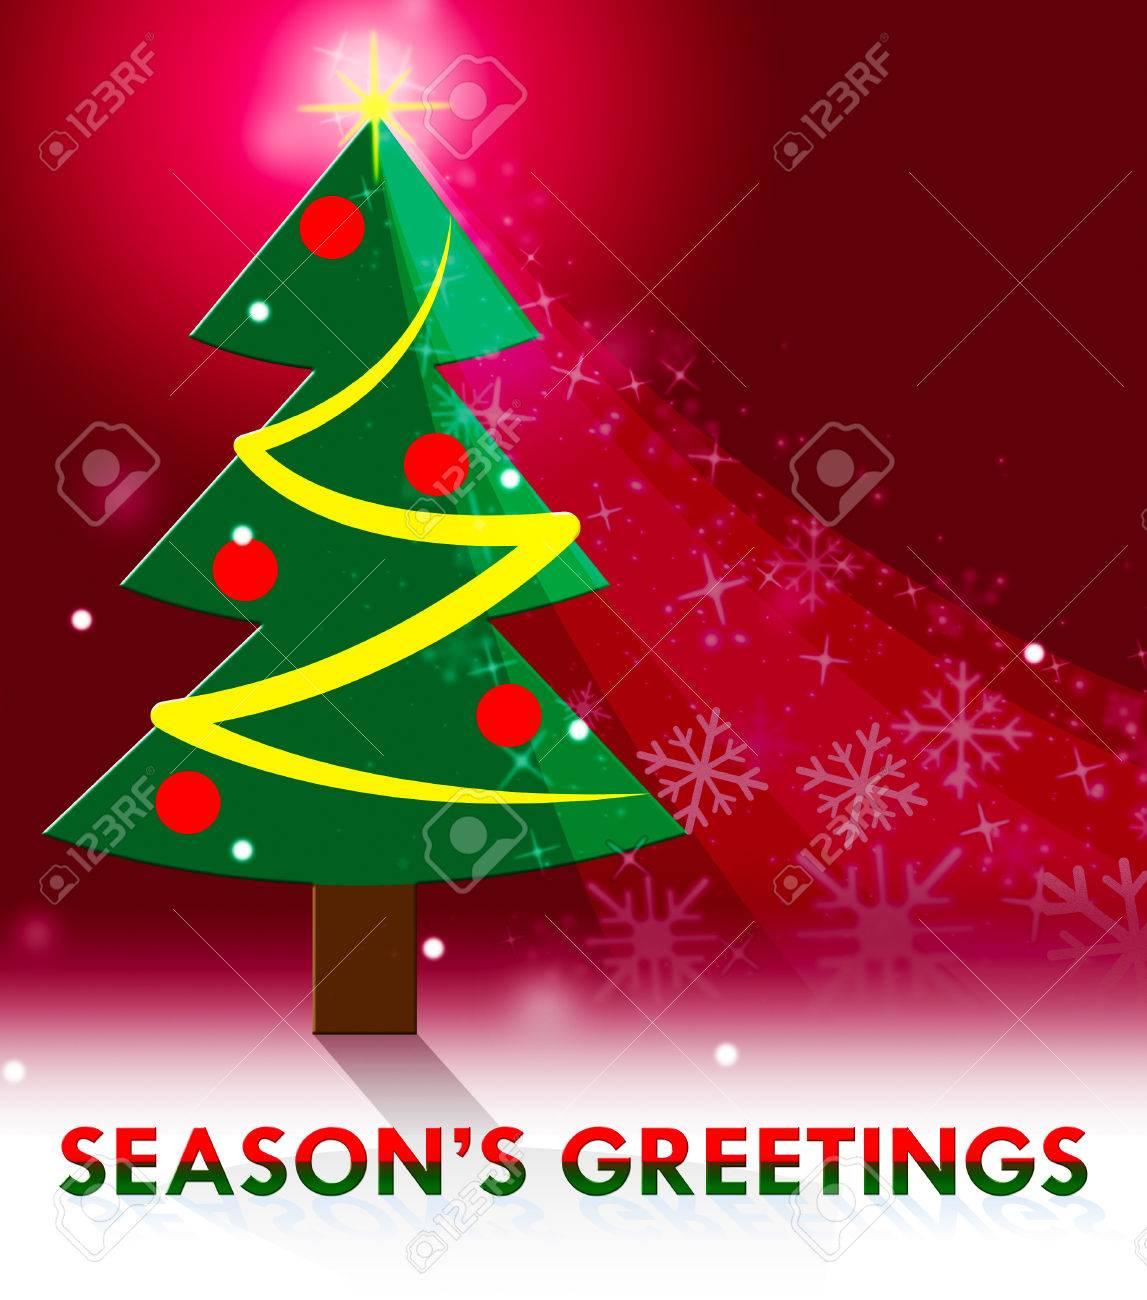 Seasons Greetings Xmas Scene Means Christmas Greeting 3d